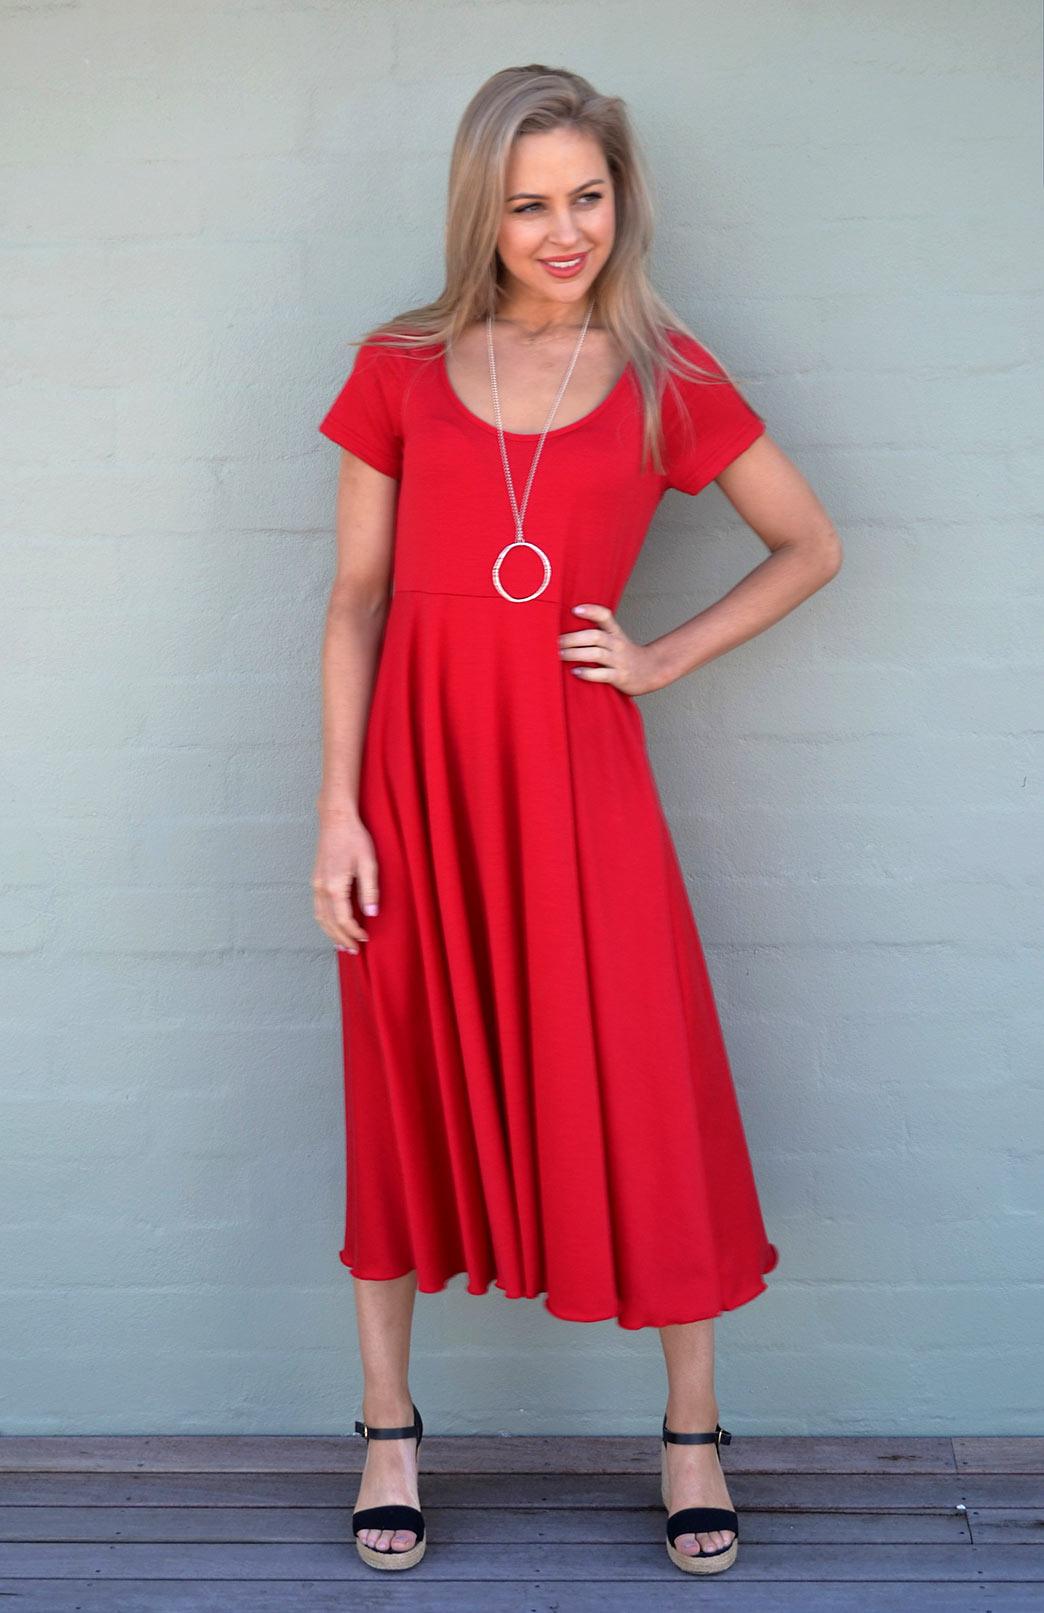 Carrie Dress - Women's Cap Sleeve Red Wool Summer Dress - Smitten Merino Tasmania Australia